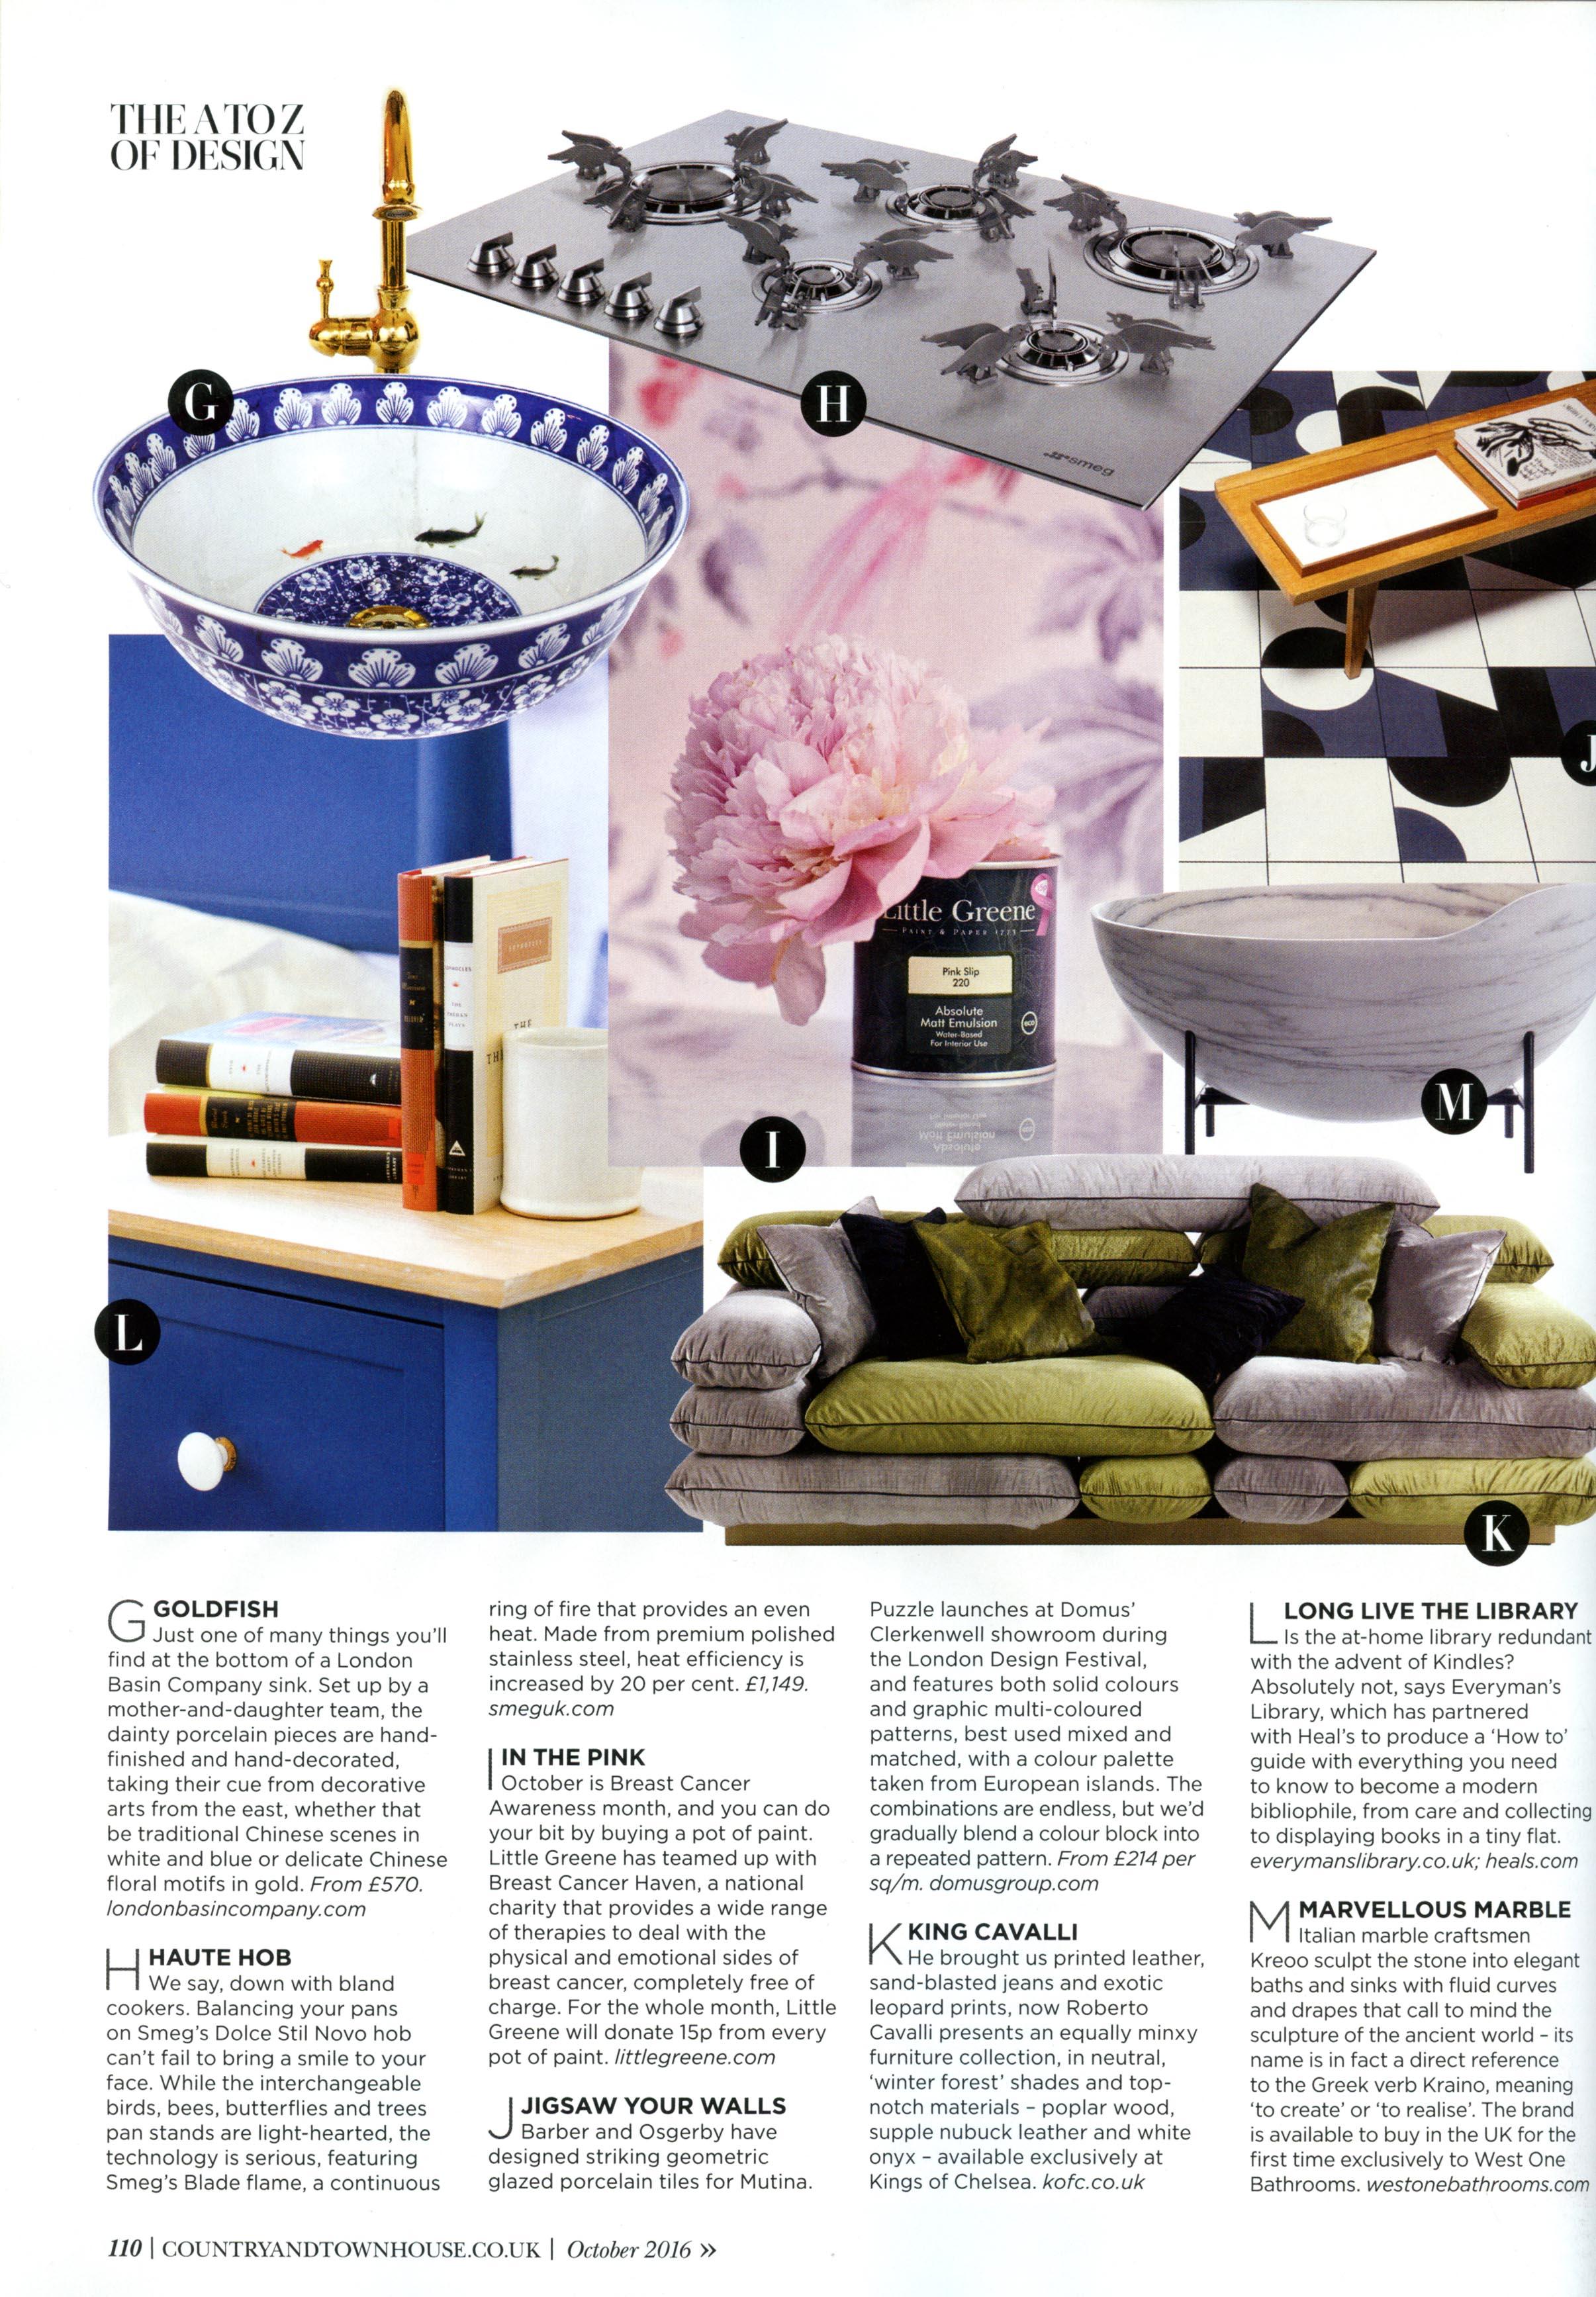 Real Homes - 157 Ideas to Transform Your Bathroom - September 2016 LBC.jpg